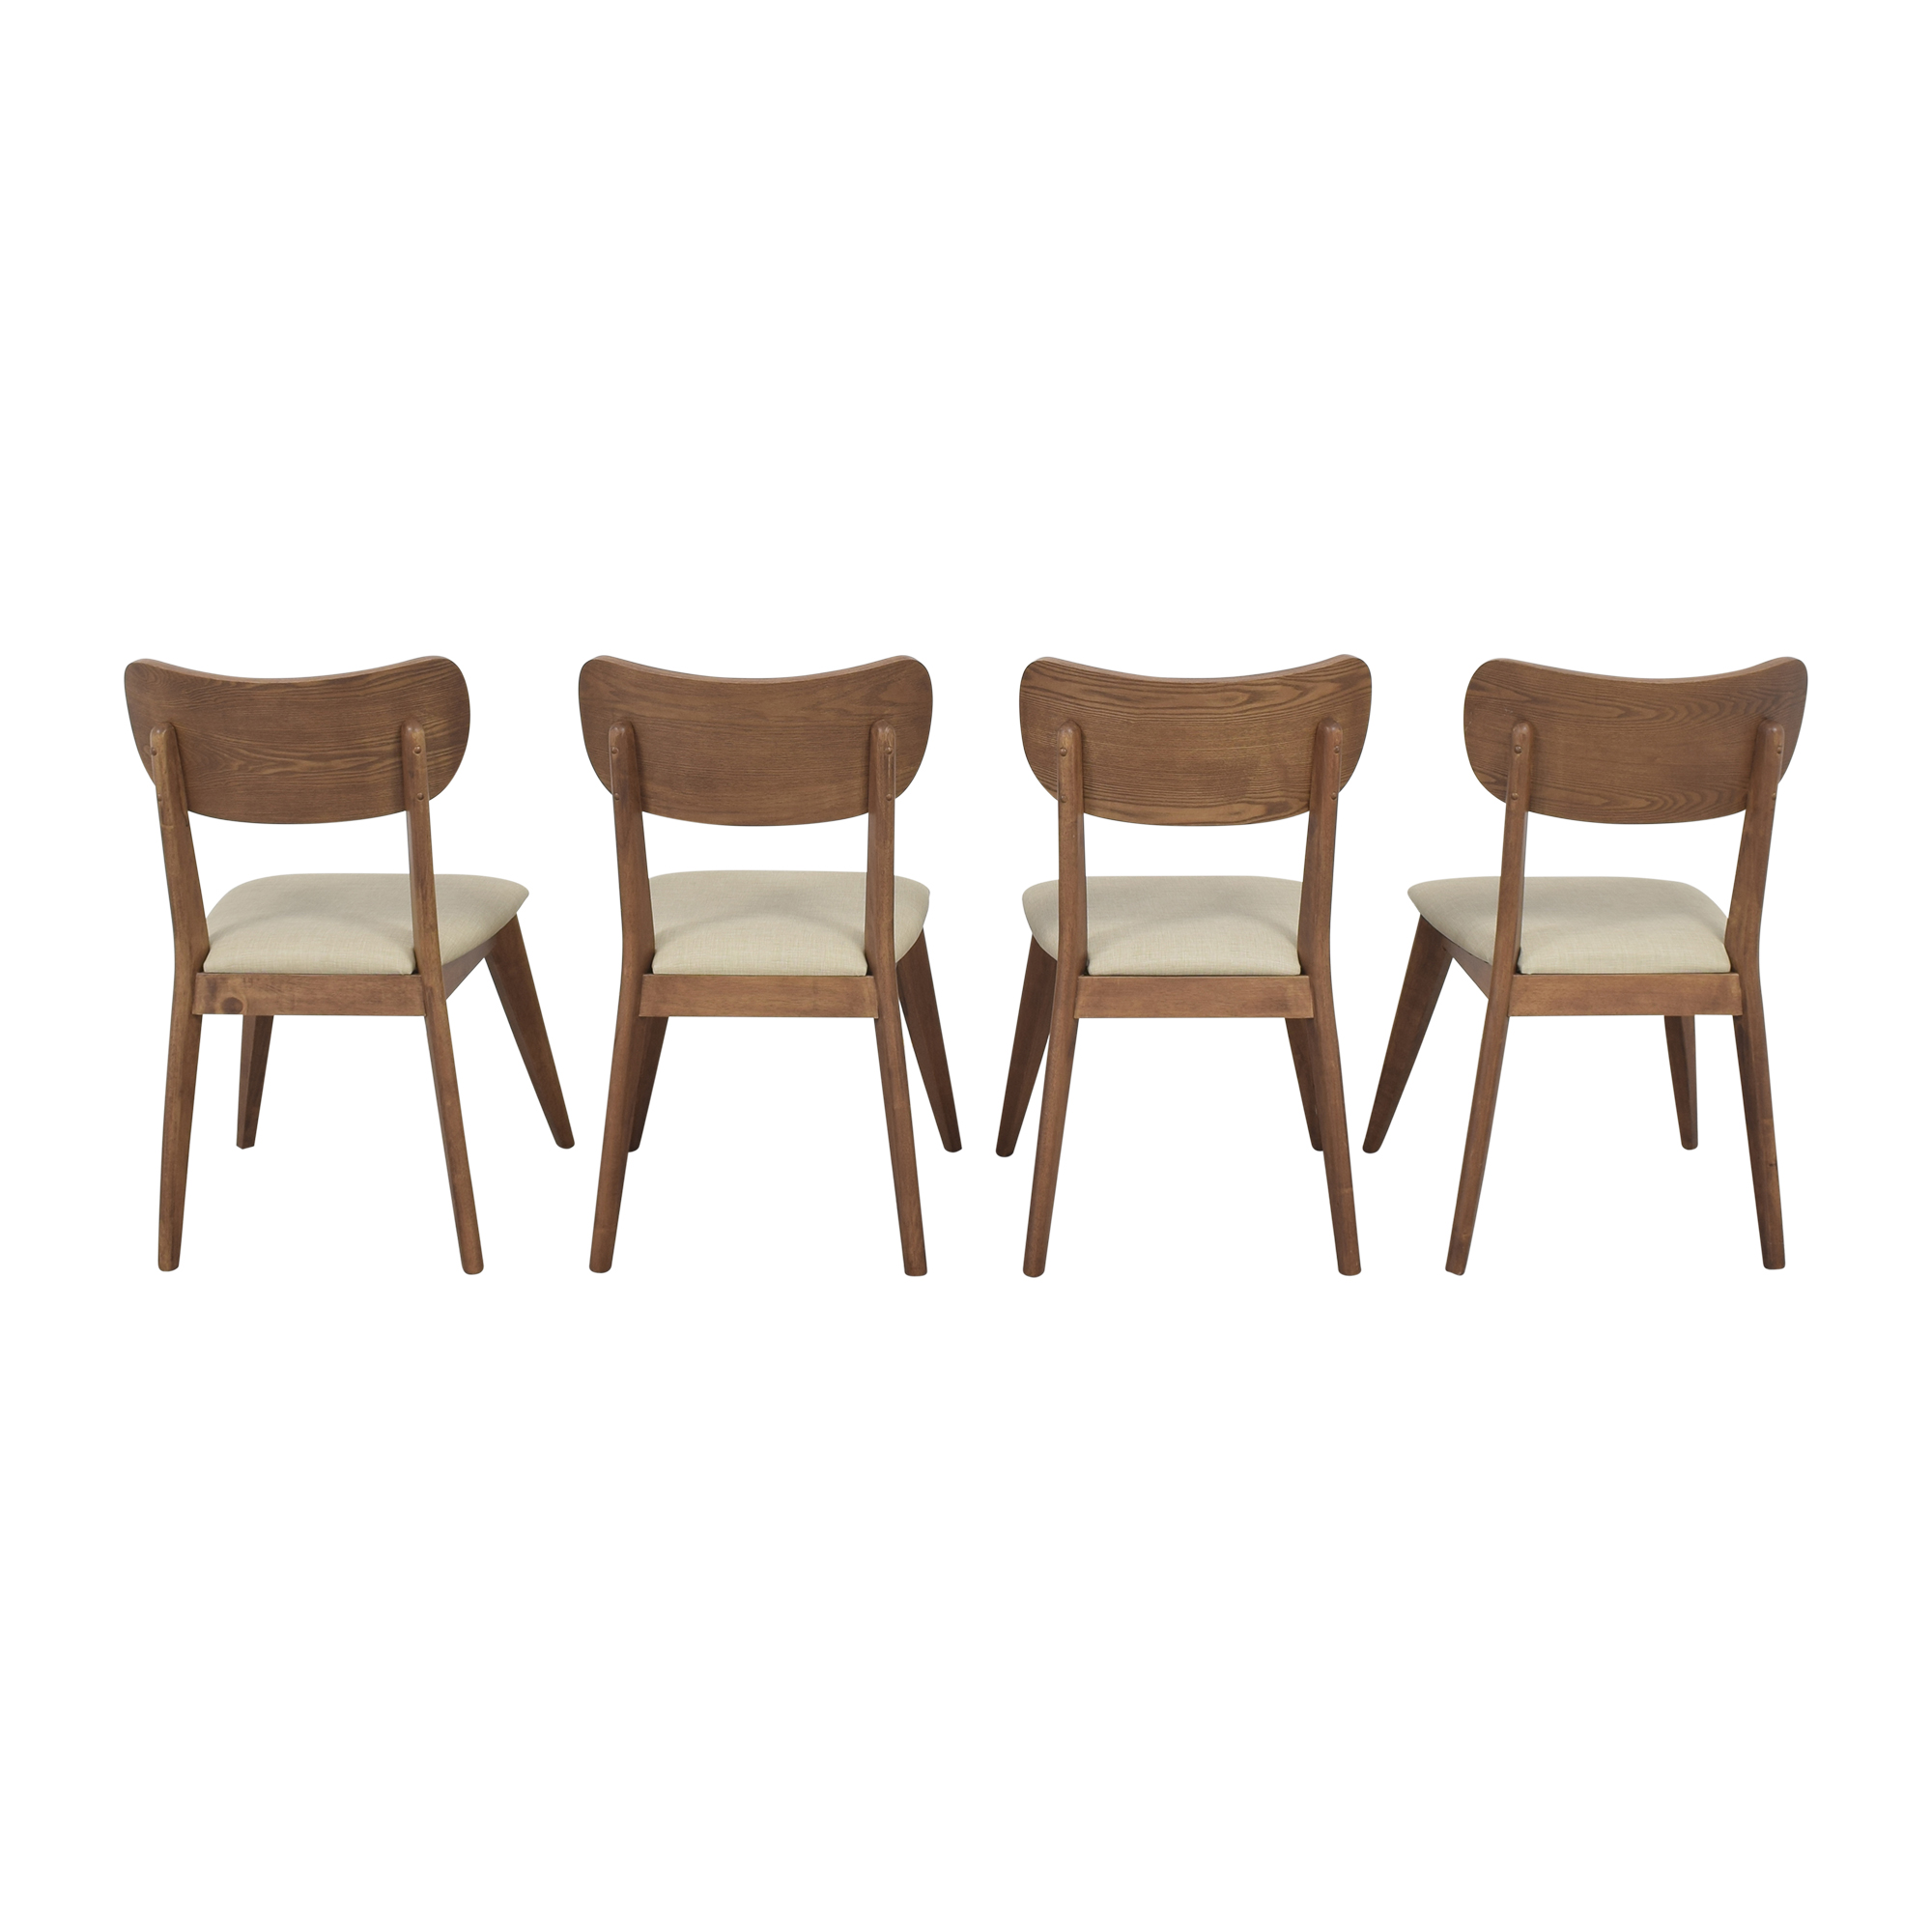 AllModern AllModern Mid-Century Modern Style Dining Chairs ma